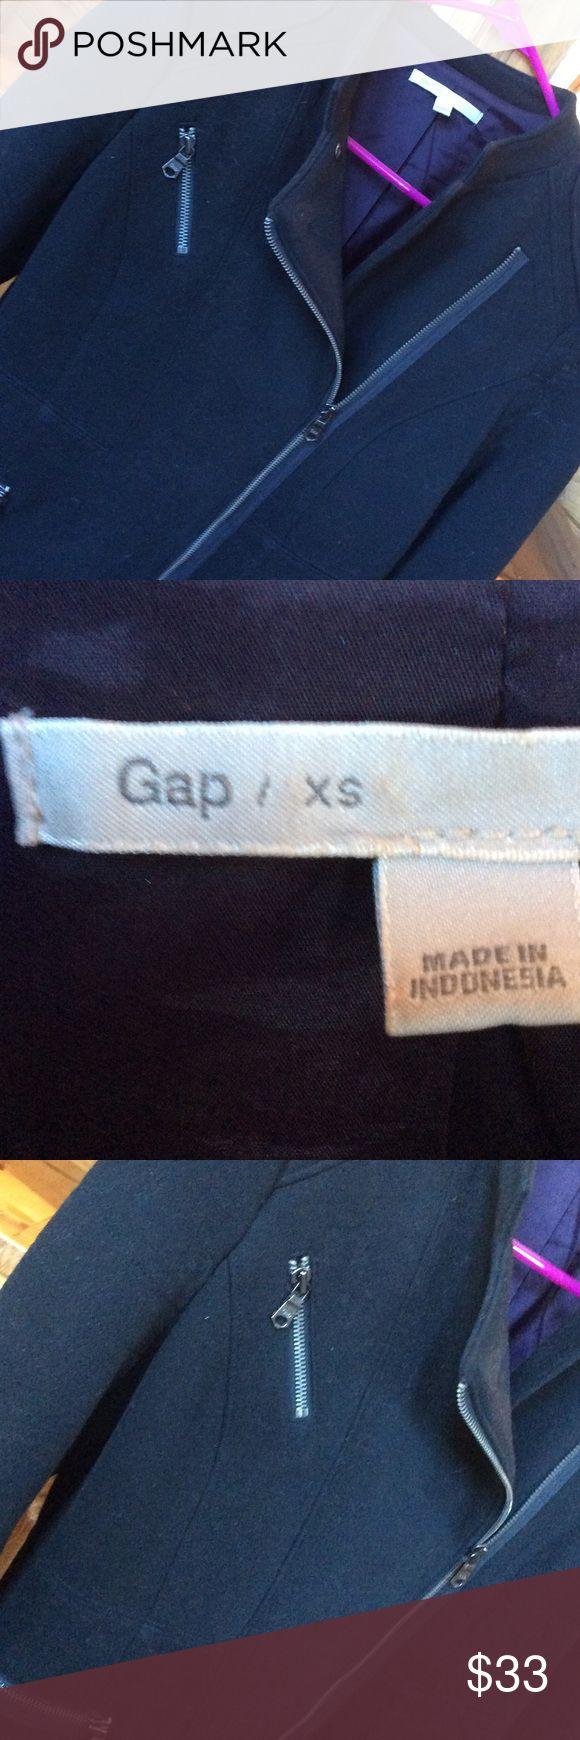 Gap jacket Dark navy blue, looks almost black  XS  jacket with zippered sleeves GAP Jackets & Coats Utility Jackets